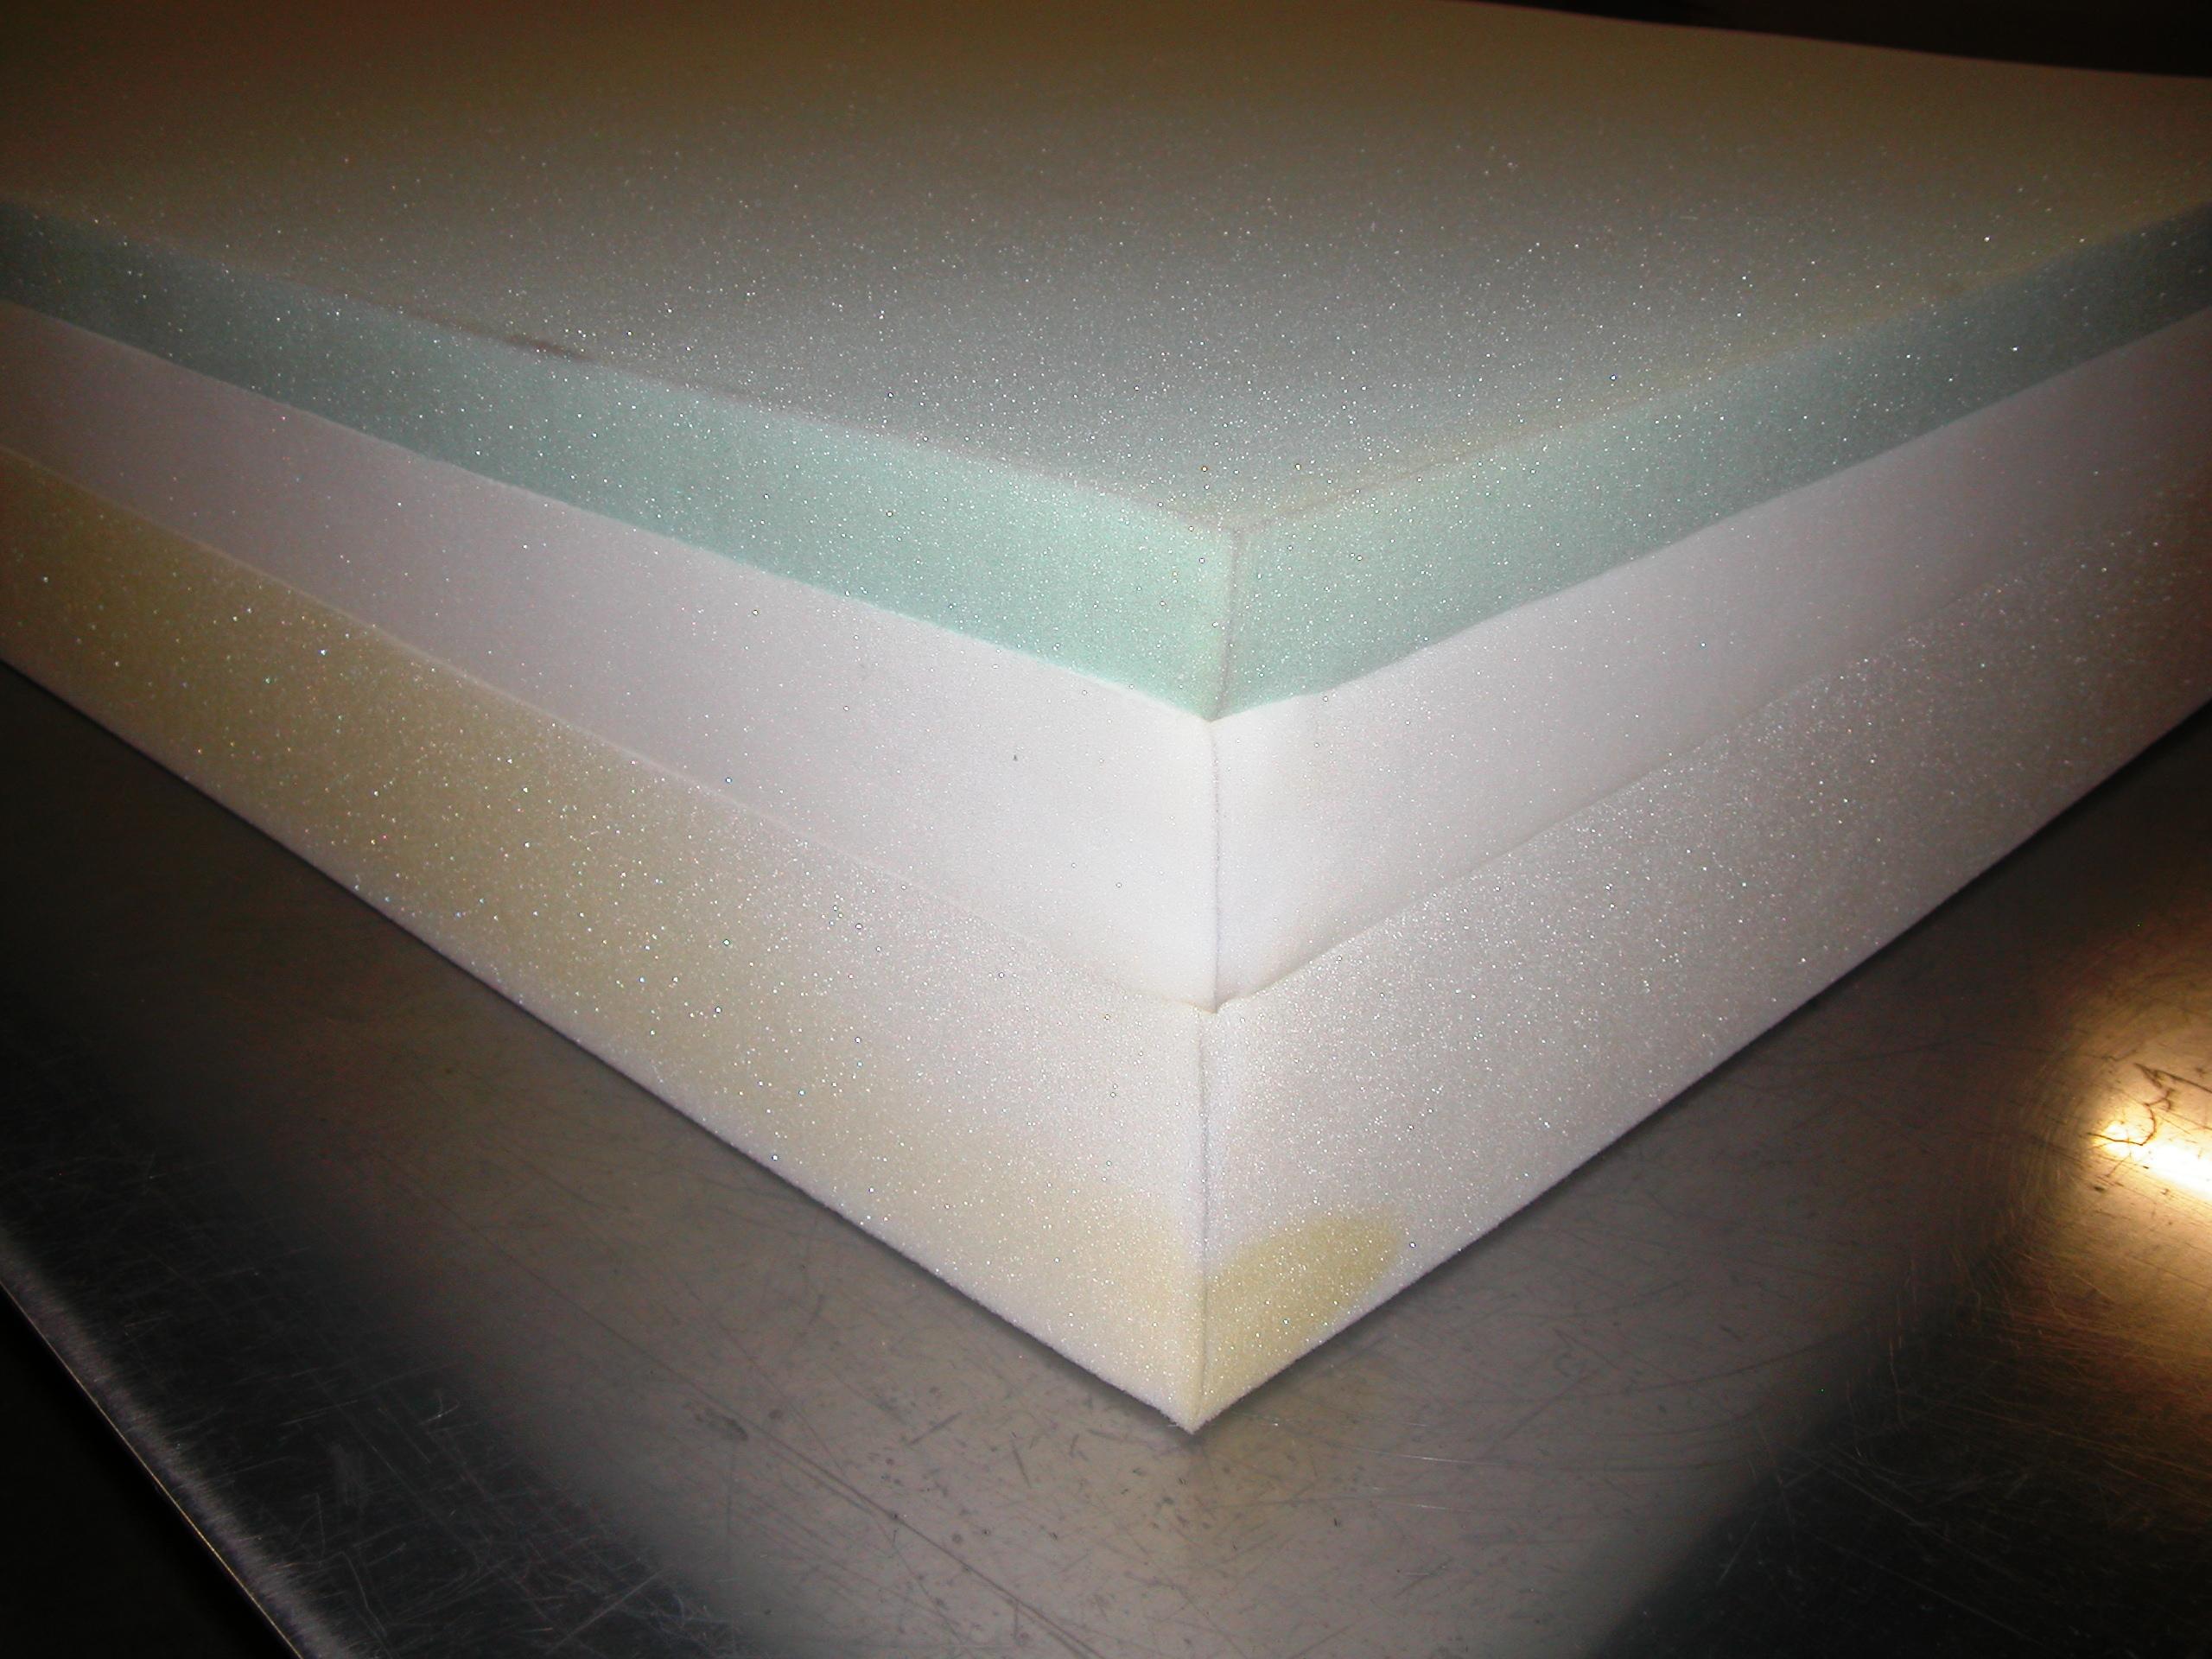 A competitor's 3 layered mattress